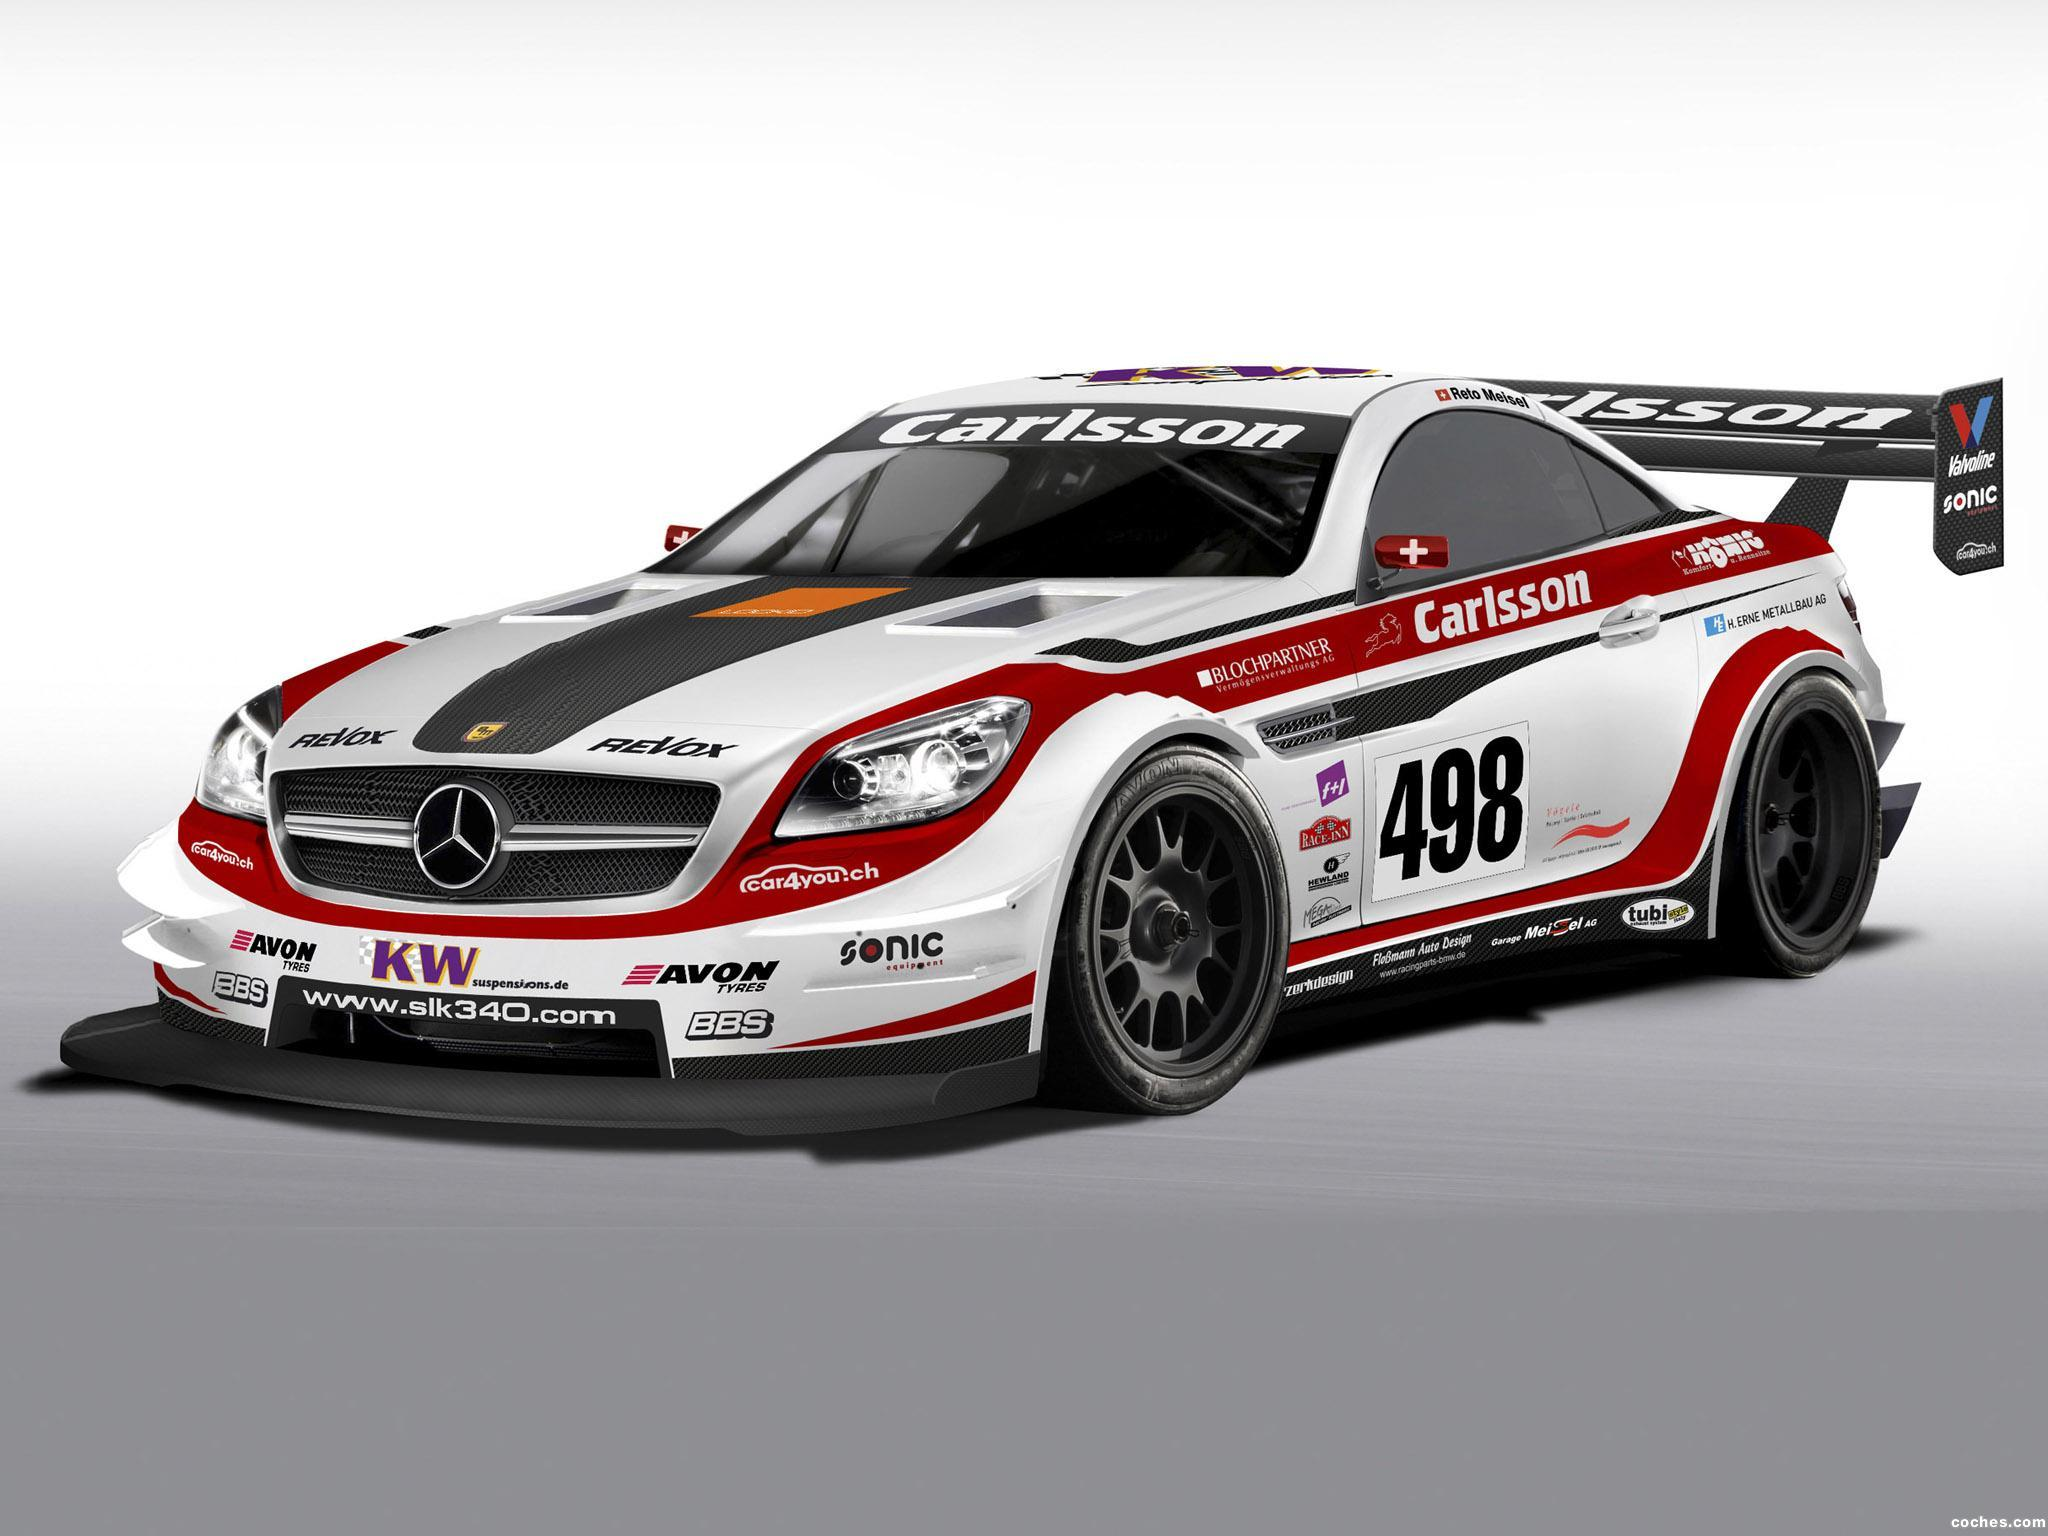 carlsson_mercedes-slk-race-car-2013_r2